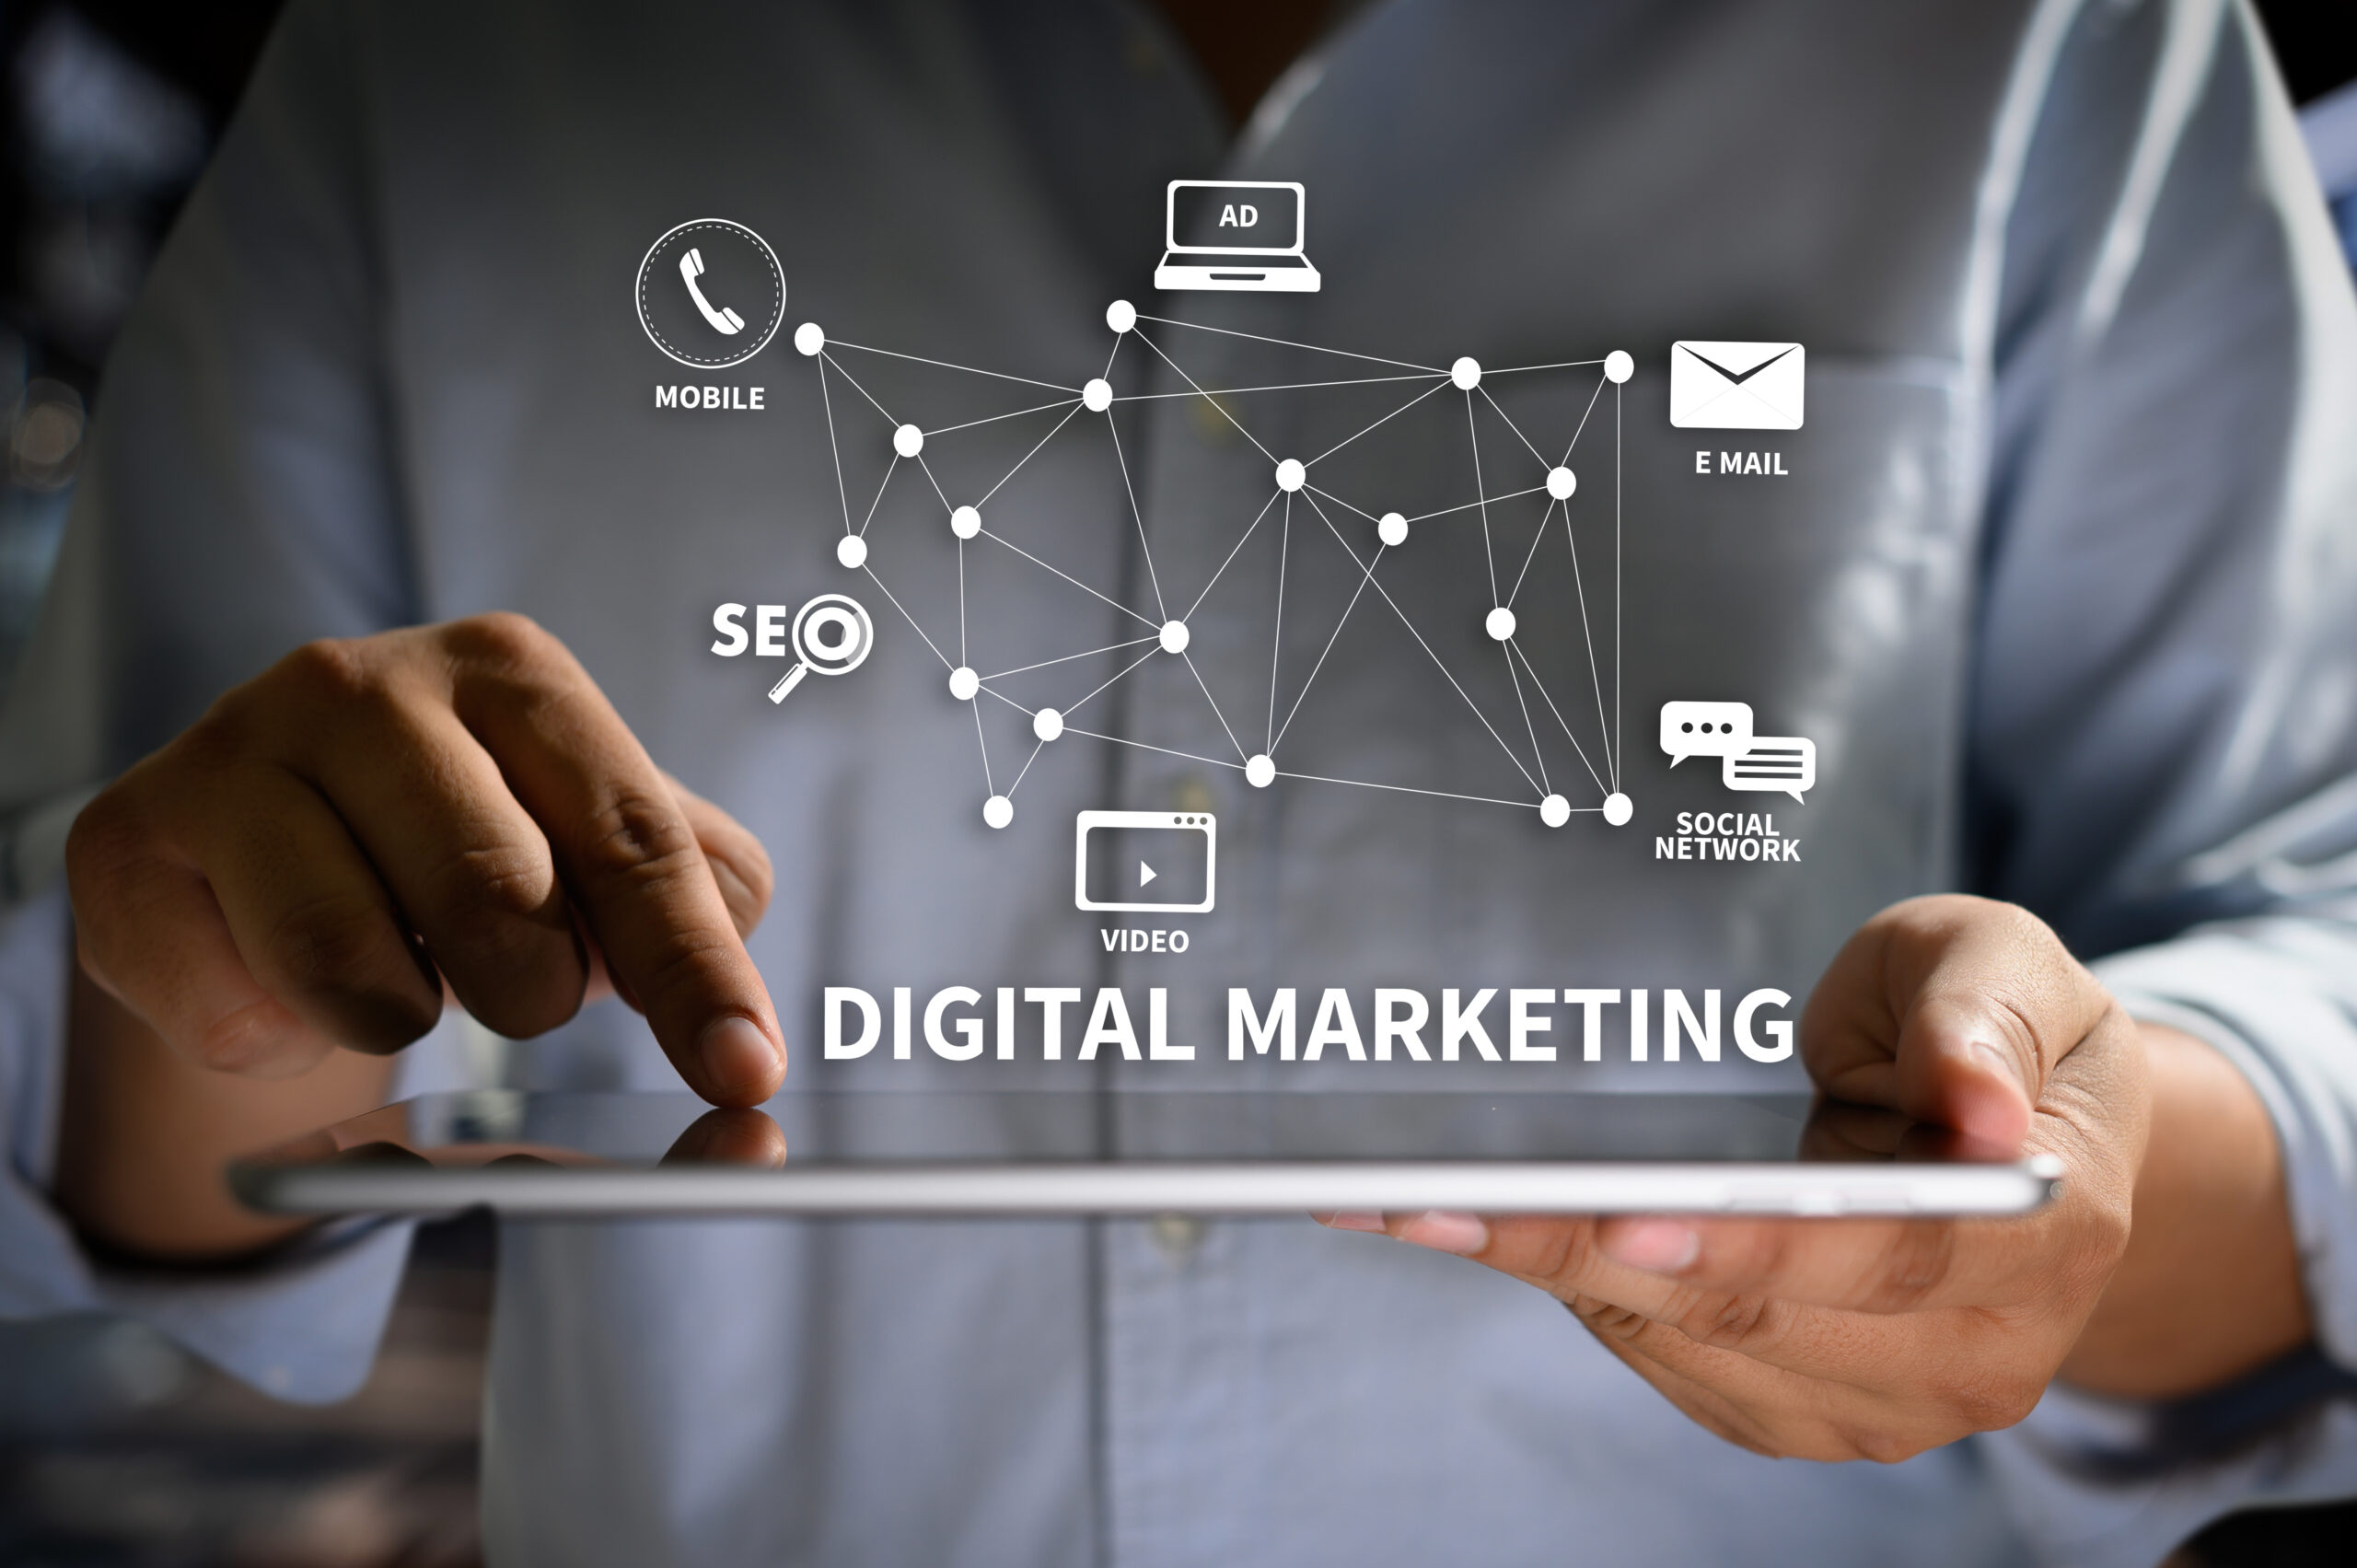 digital-marketing-new-startup-project-online-search-engine-optimisation-scaled.jpg